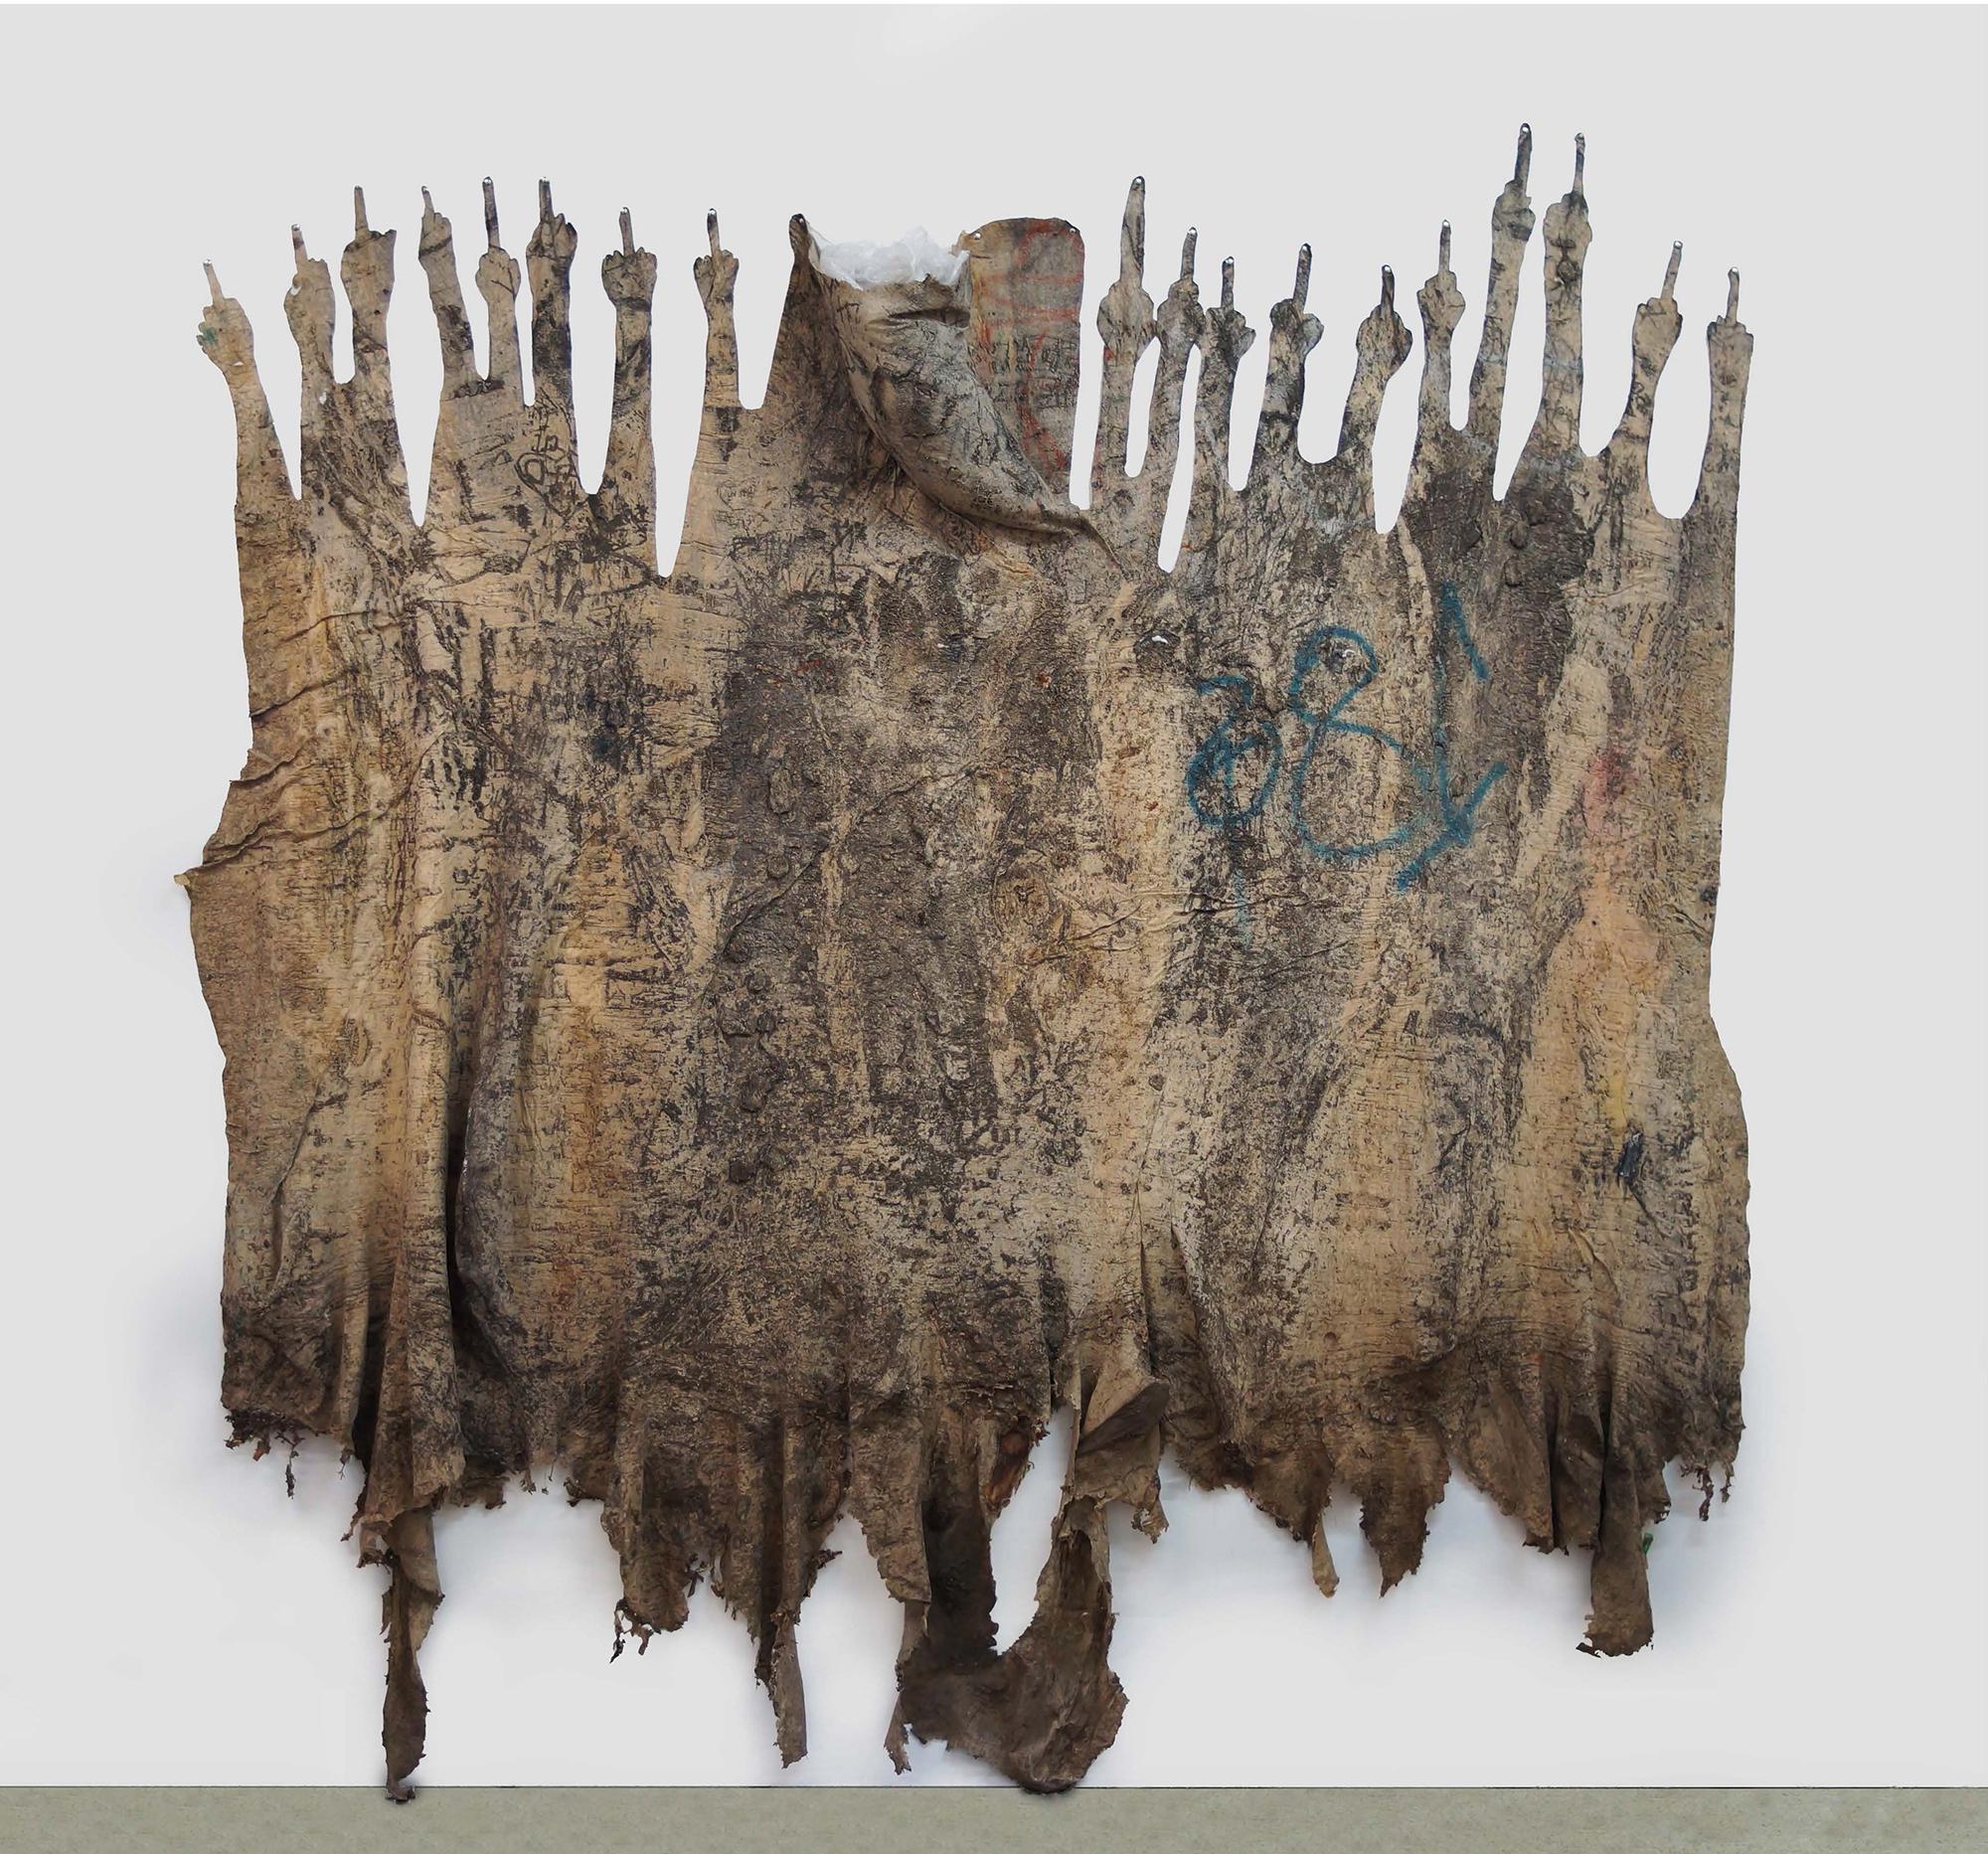 Eddie Rodolfo Aparicio. <em>Aquellos Que Apuntan Con El Dedo Medio (11th and Union Streets, Los Angeles, California)</em>, 2017. Rubber, sulfur, resin, tree and paint residue on cotton, 102 x 180 x 6 inches (259.1 x 457.2 x 15.2 cm)